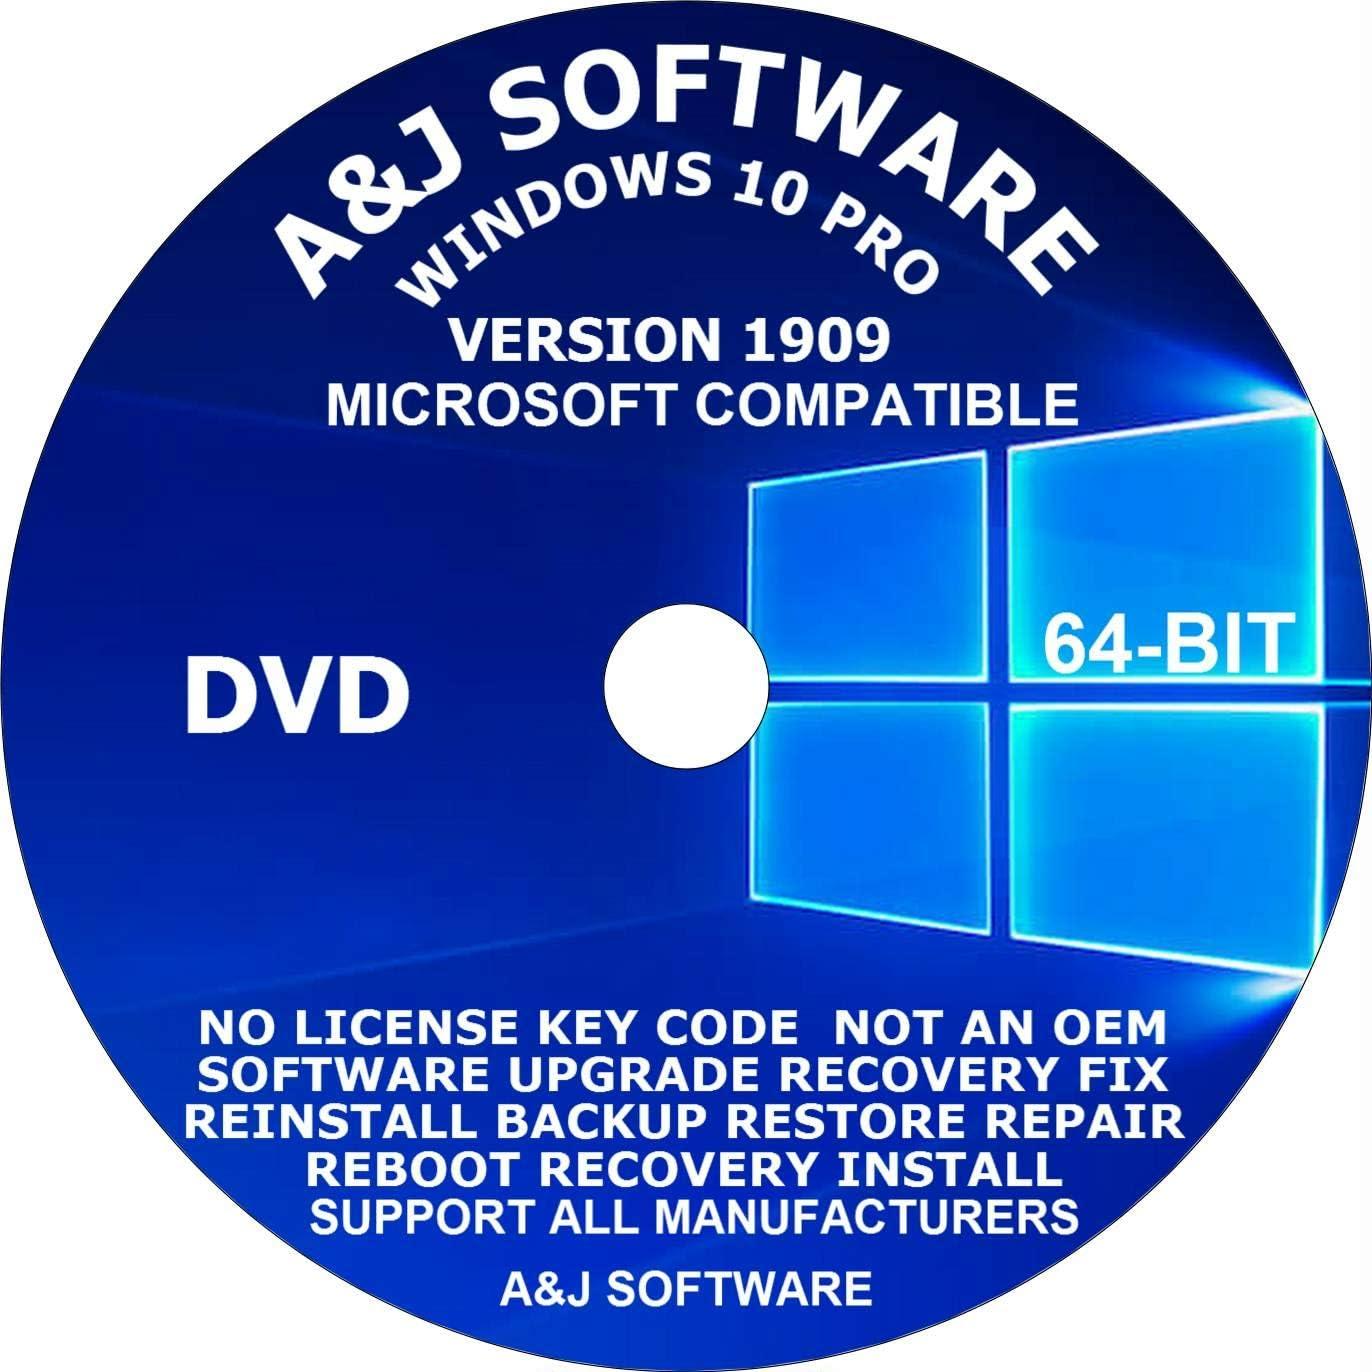 WINDOWS 10 PRO Popularity Free shipping New 64-BIT BACKUP DVD REC 1909 VERSION UPGRADE LATEST